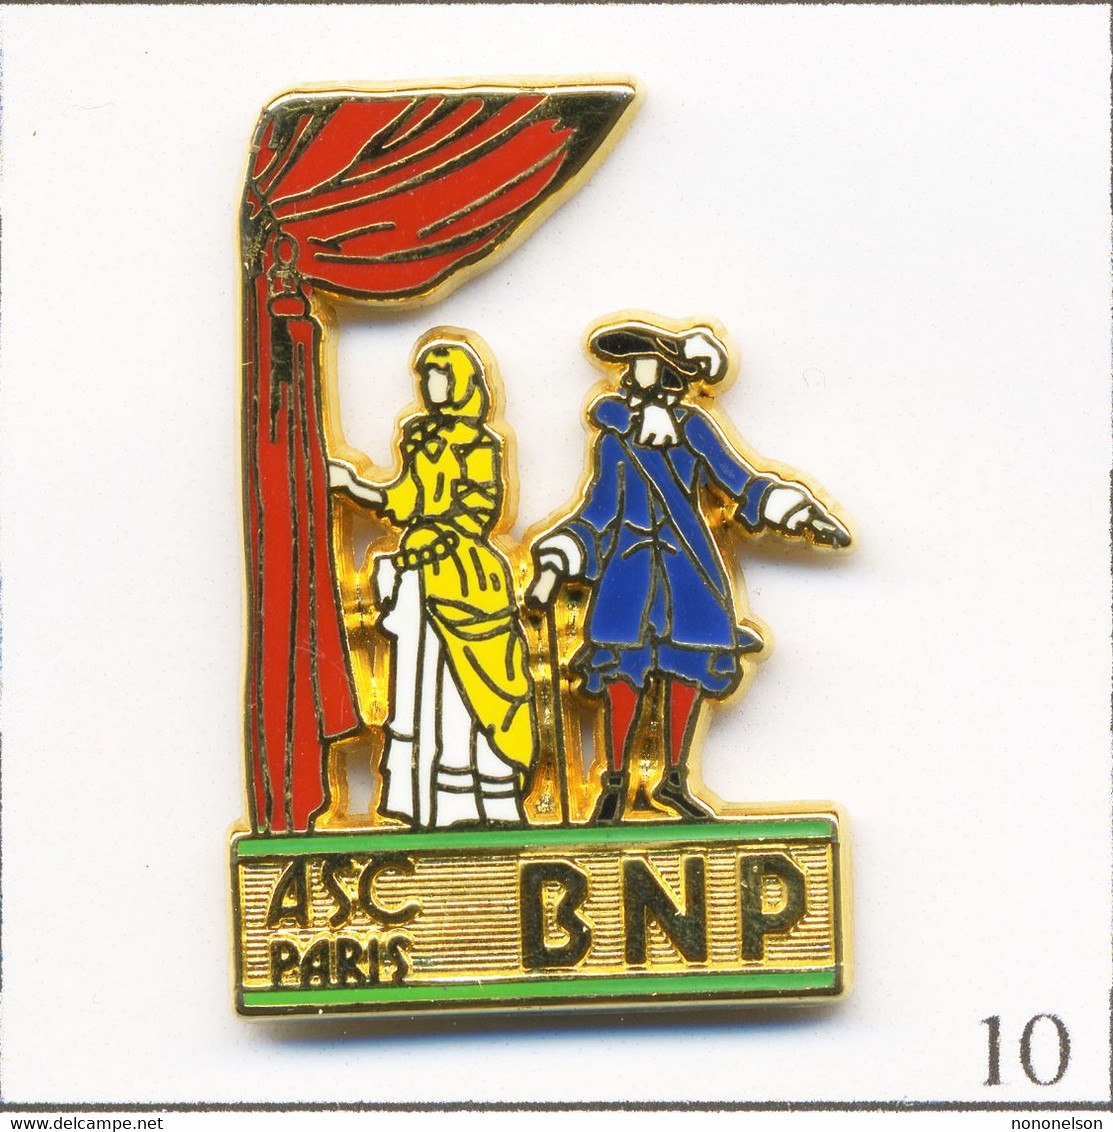 Pin's Banque / Assurance - BNP / ASC Paris - Théâtre. Estampillé Ballard. Zamac. T738-10 - Banks